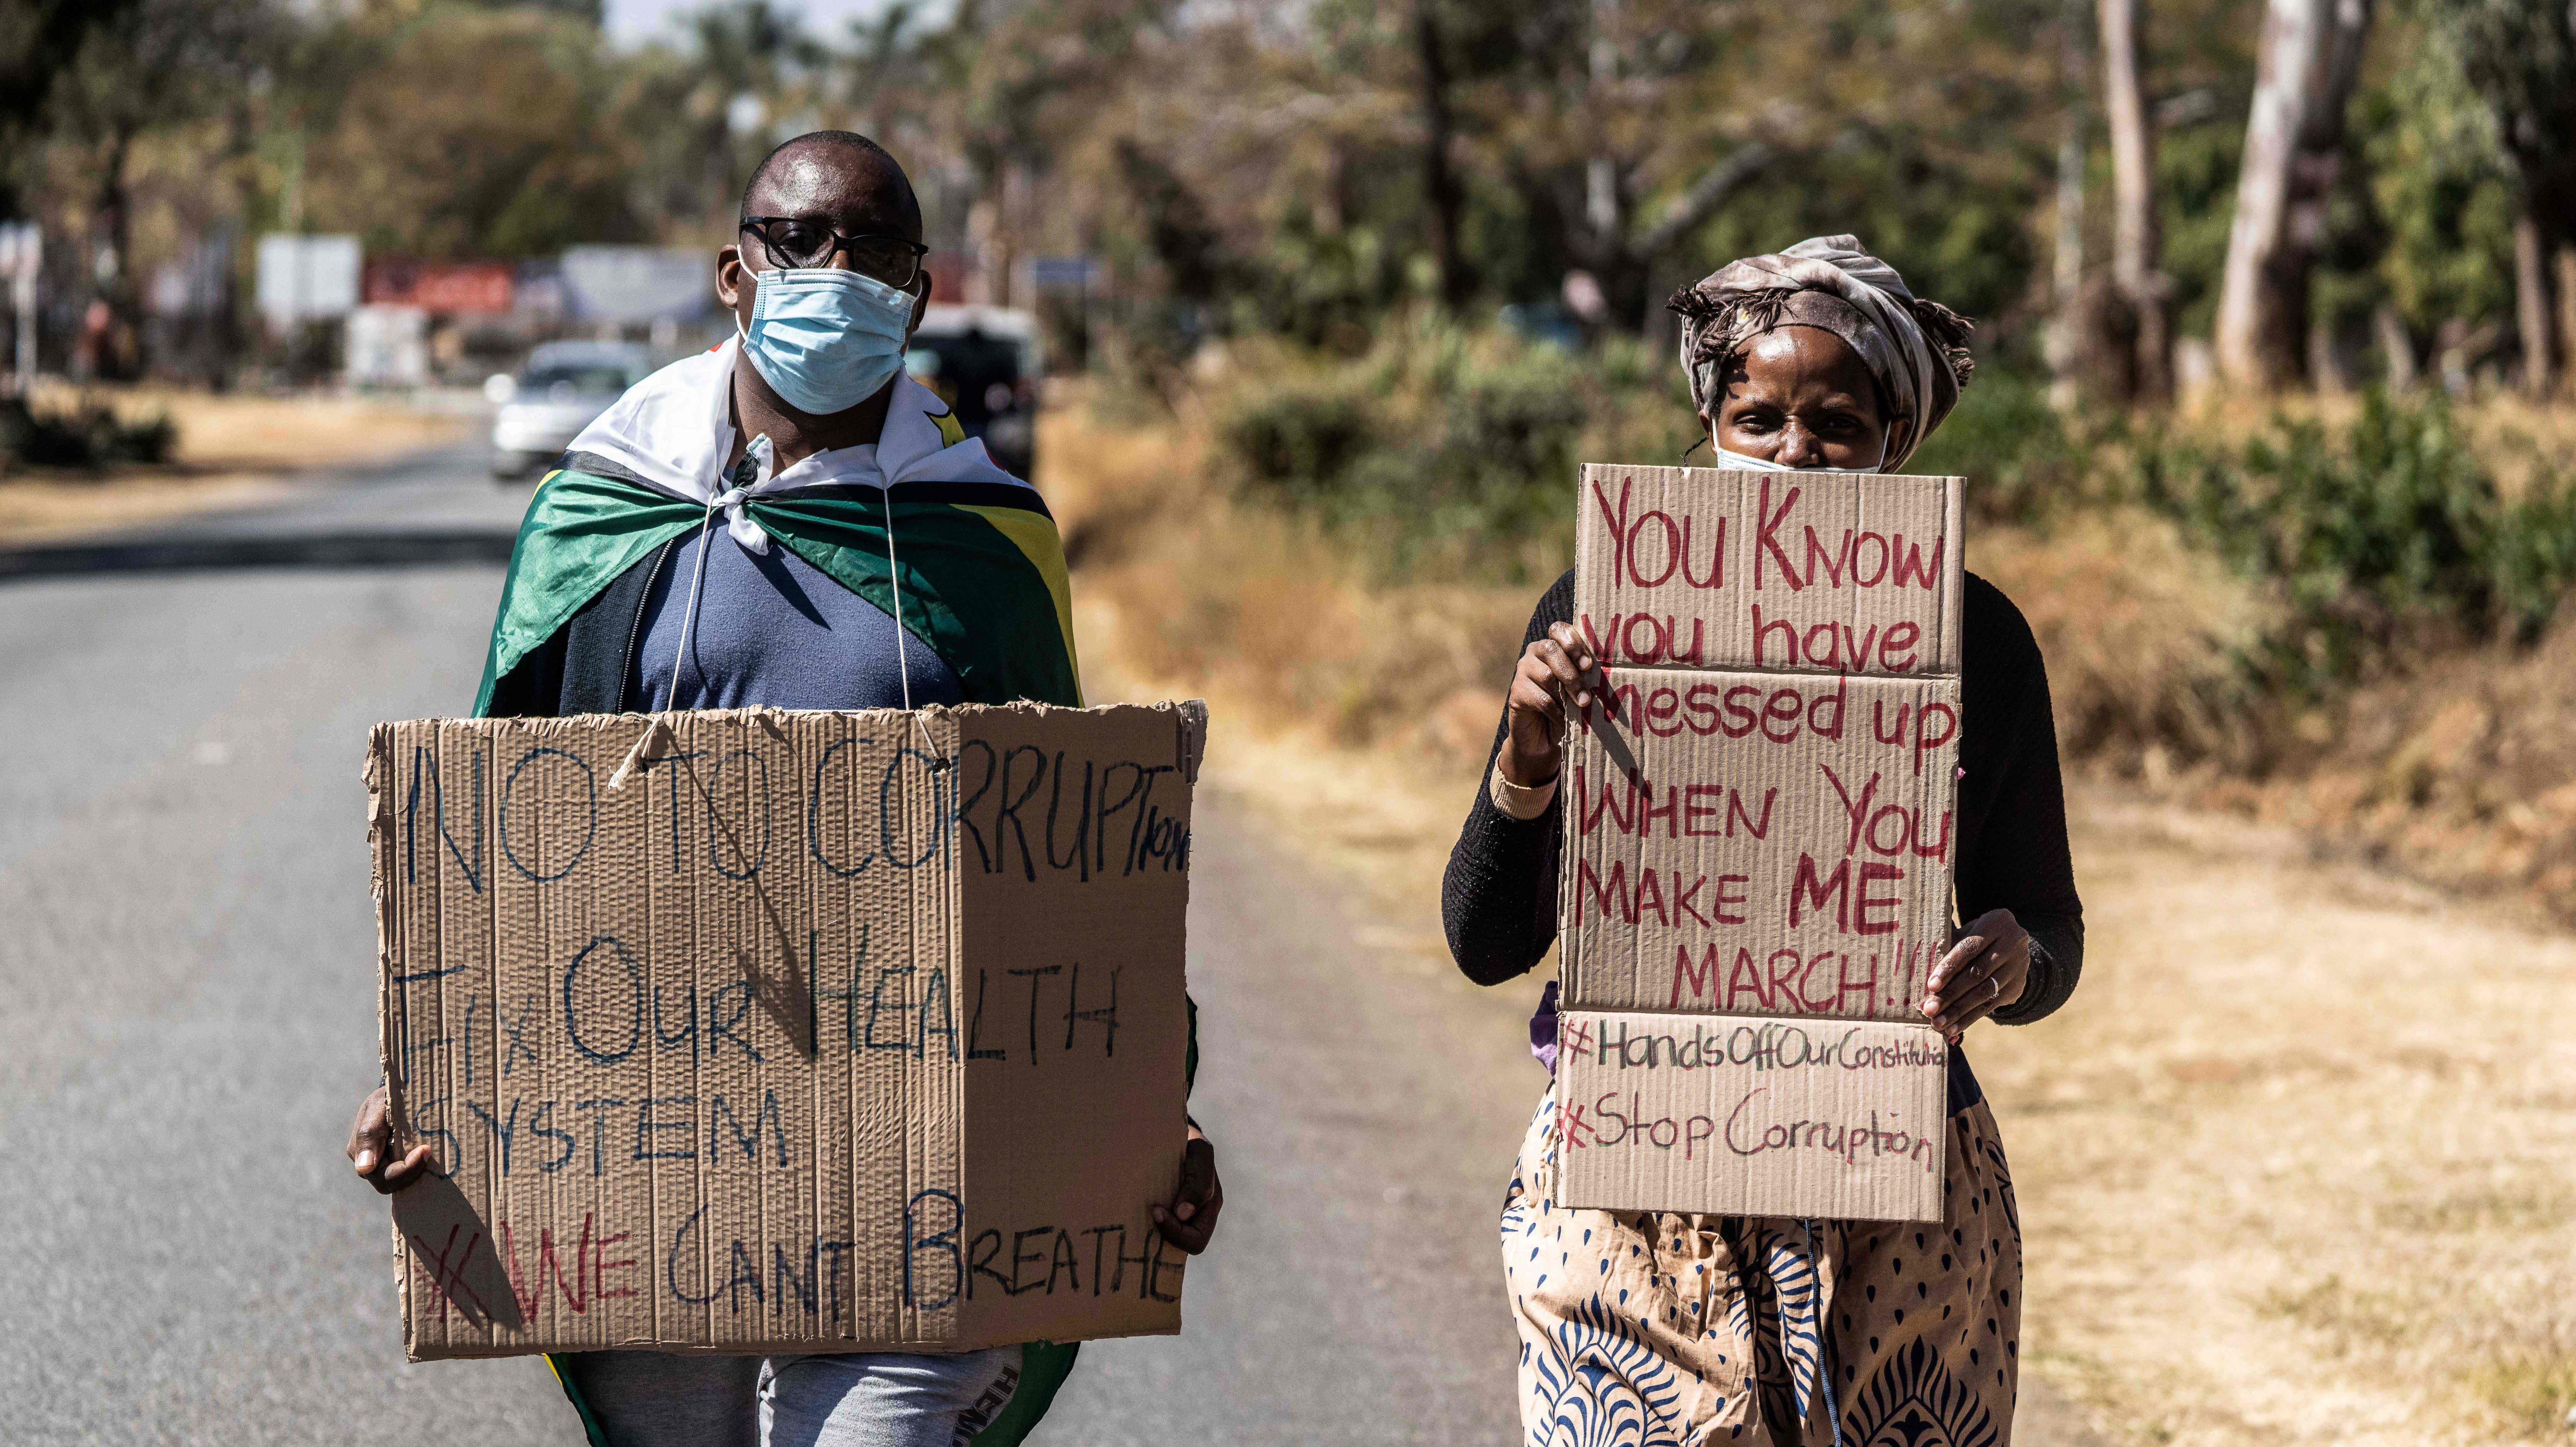 #BlackLivesMatter continues to inspire Zimbabwe's online activists